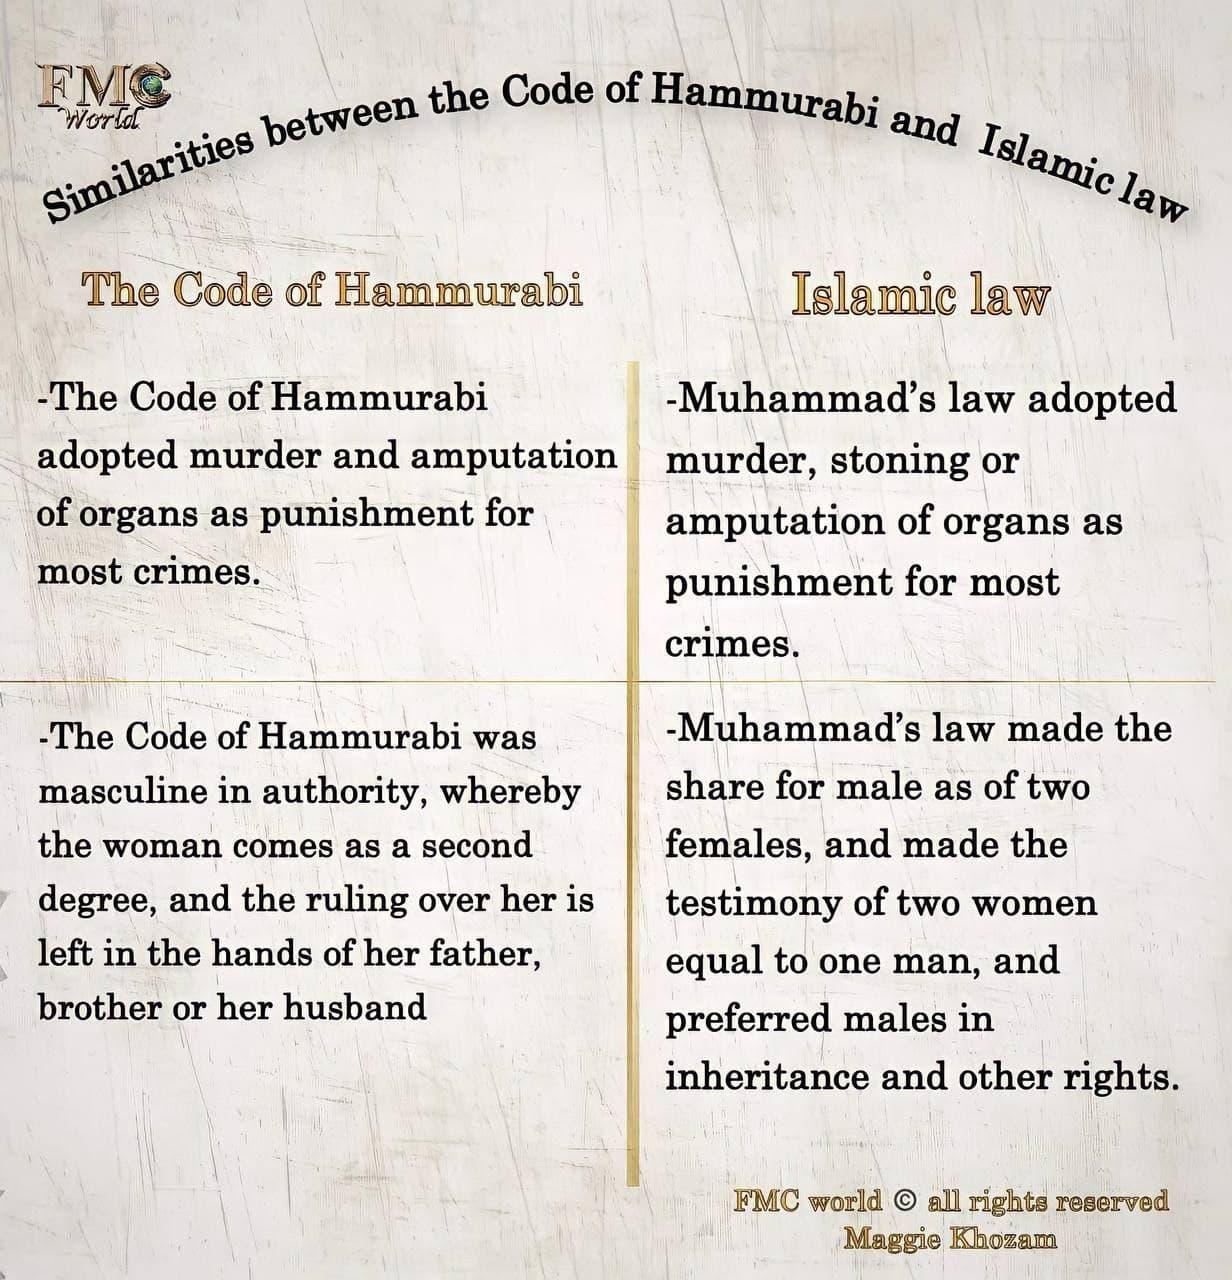 Islamic VS Hammurabi Law